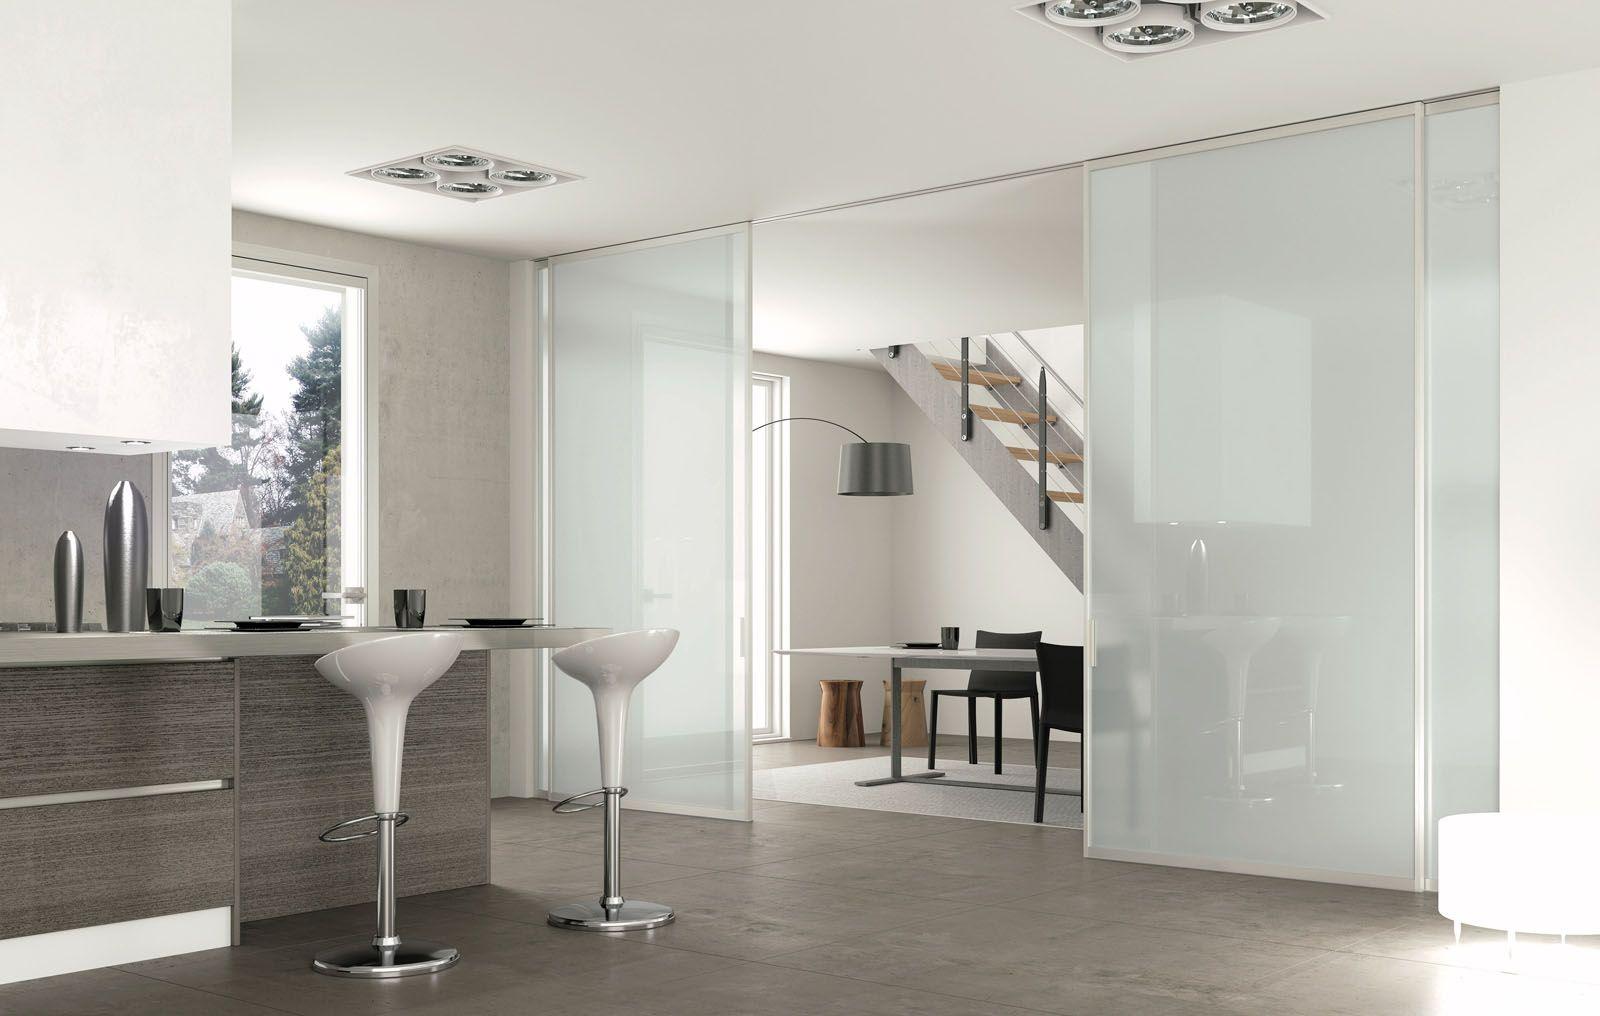 kitchen | Ideas for my home | Porte vetro scorrevoli, Porte ...